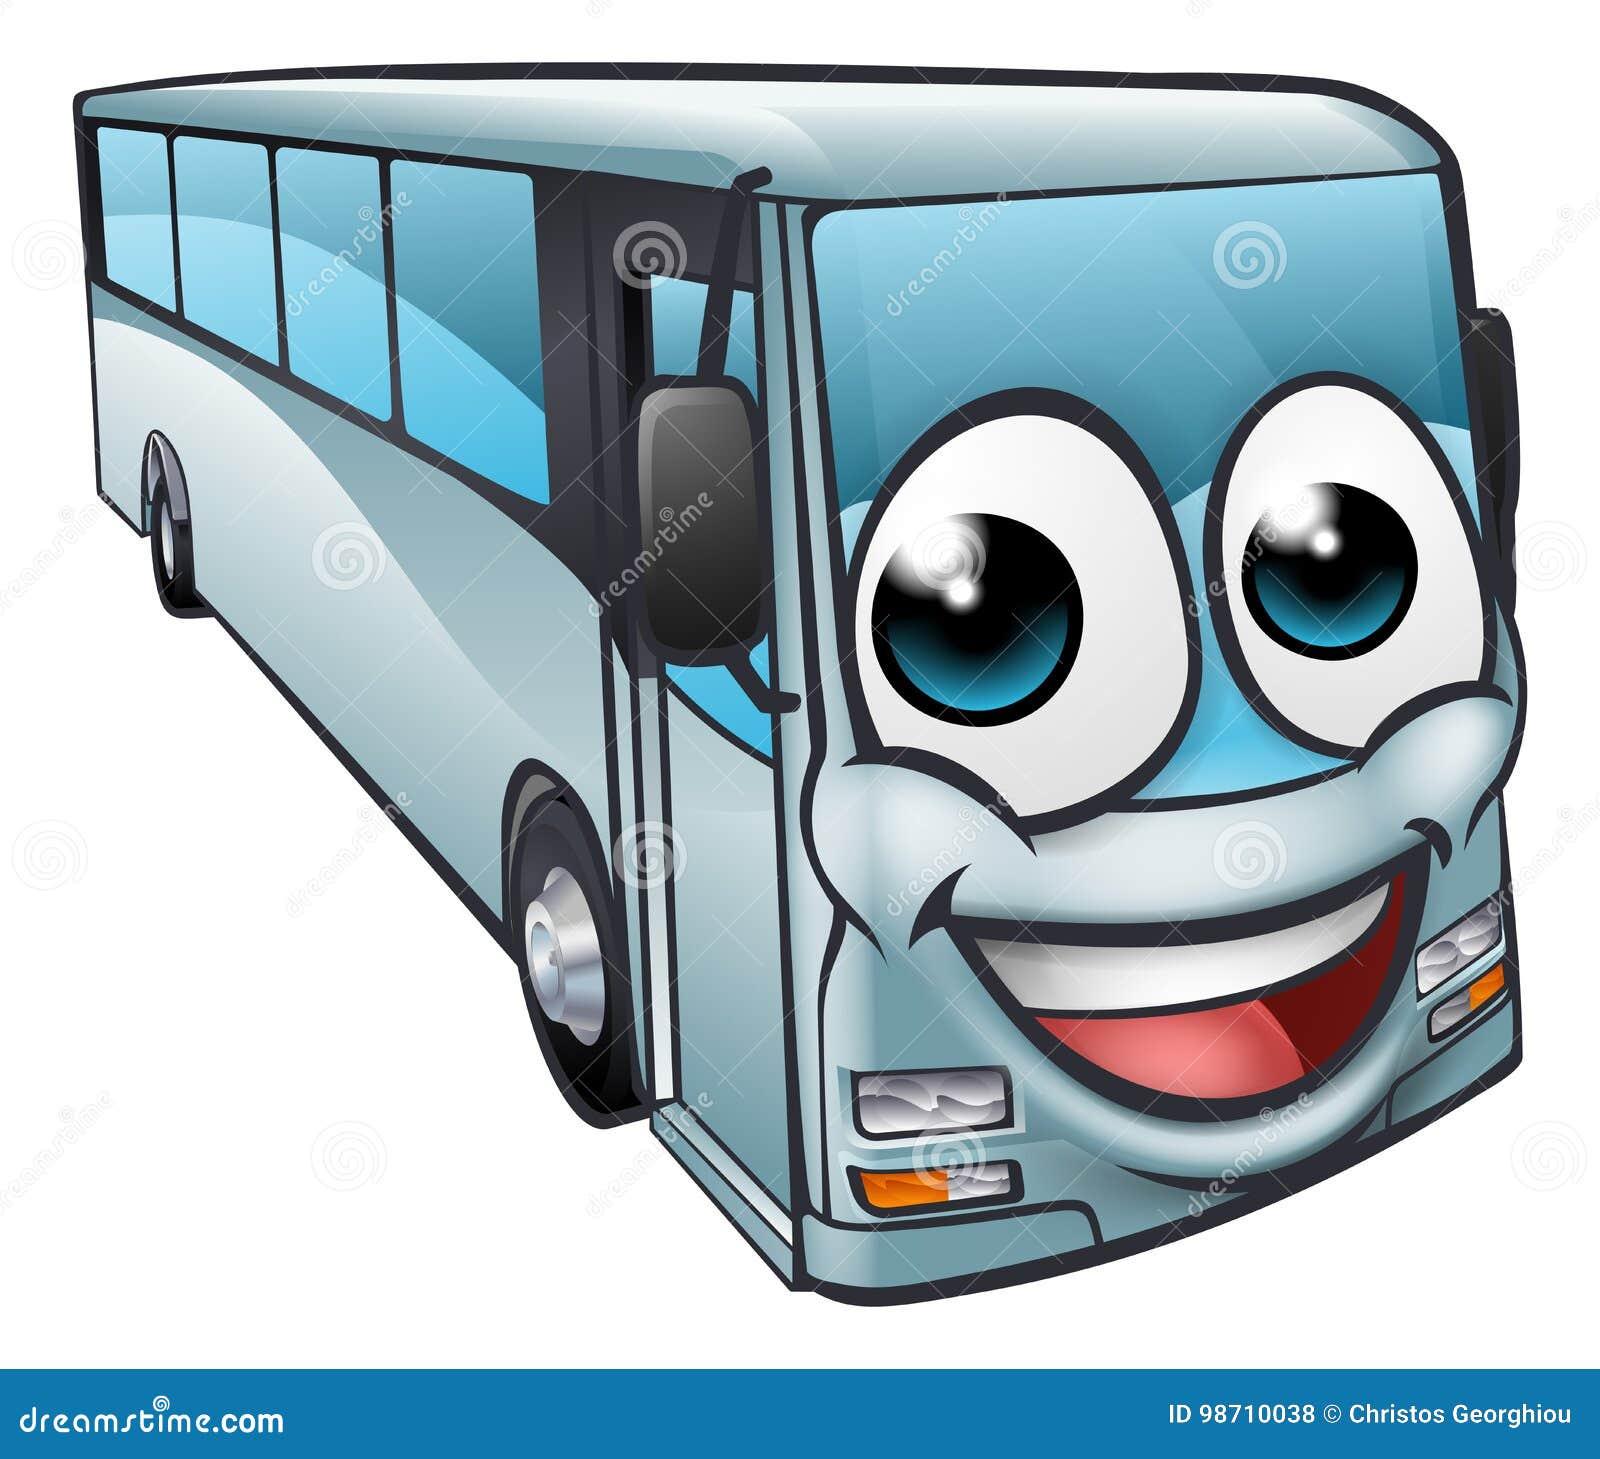 Coach Bus Cartoon Character Mascot Stock Vector